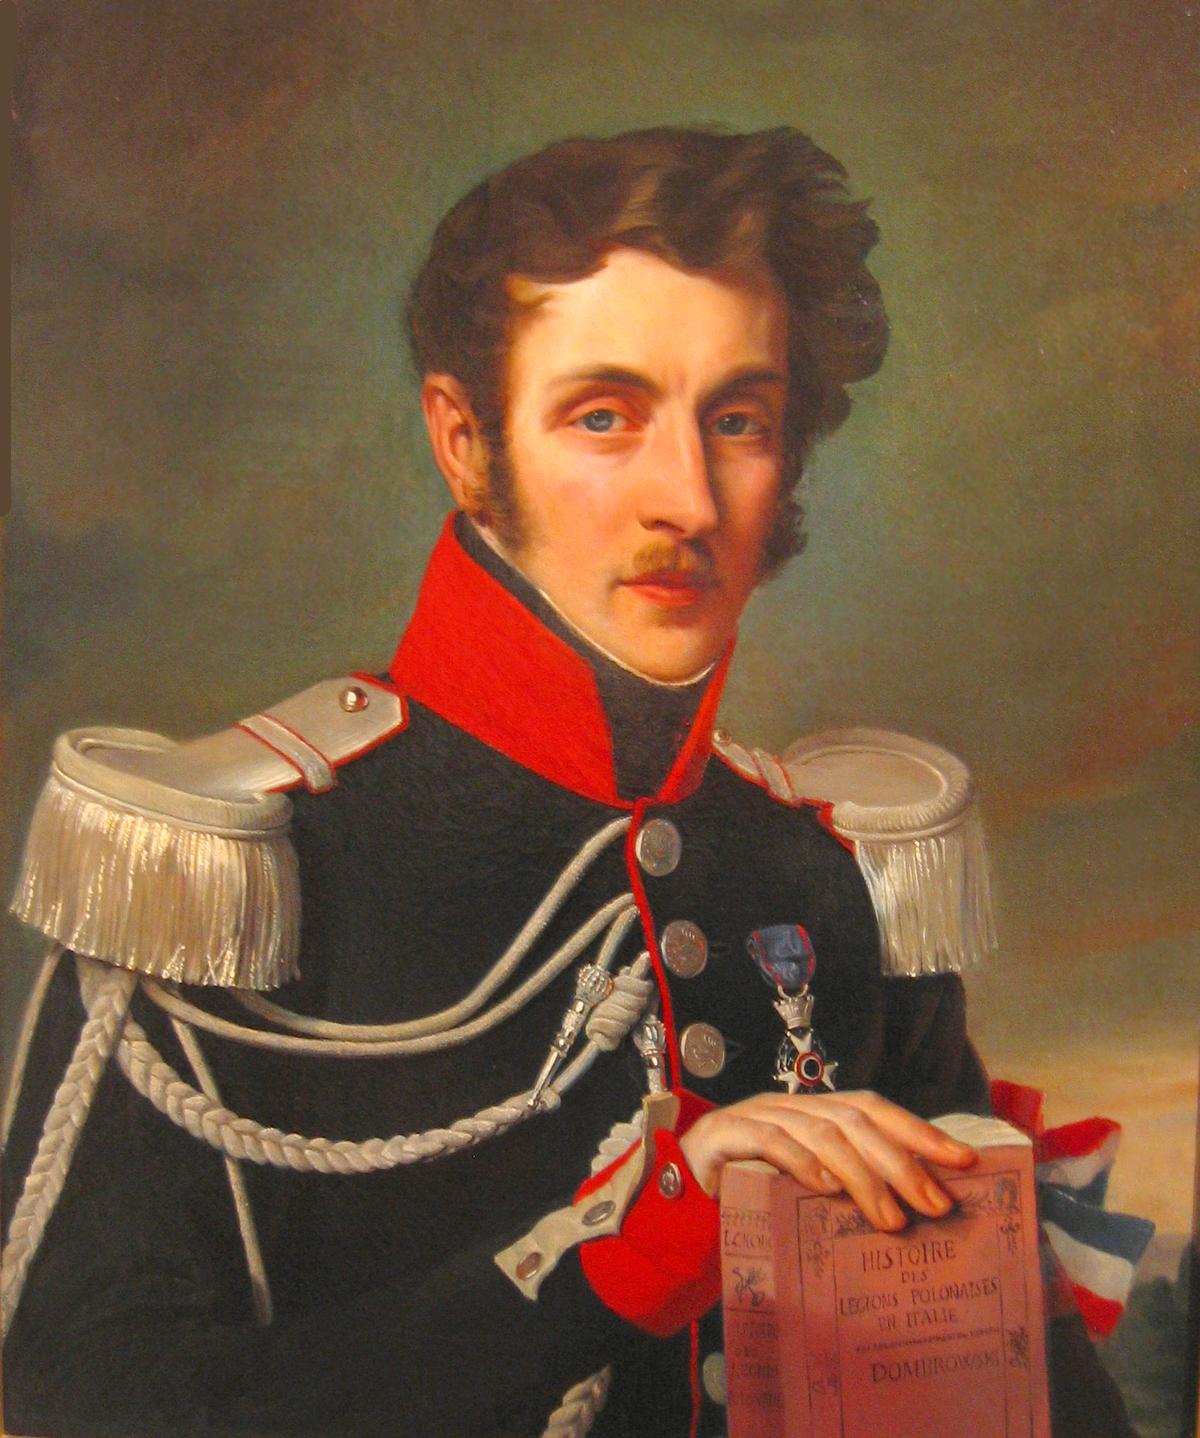 Leonard Chodźko - Wikipedia